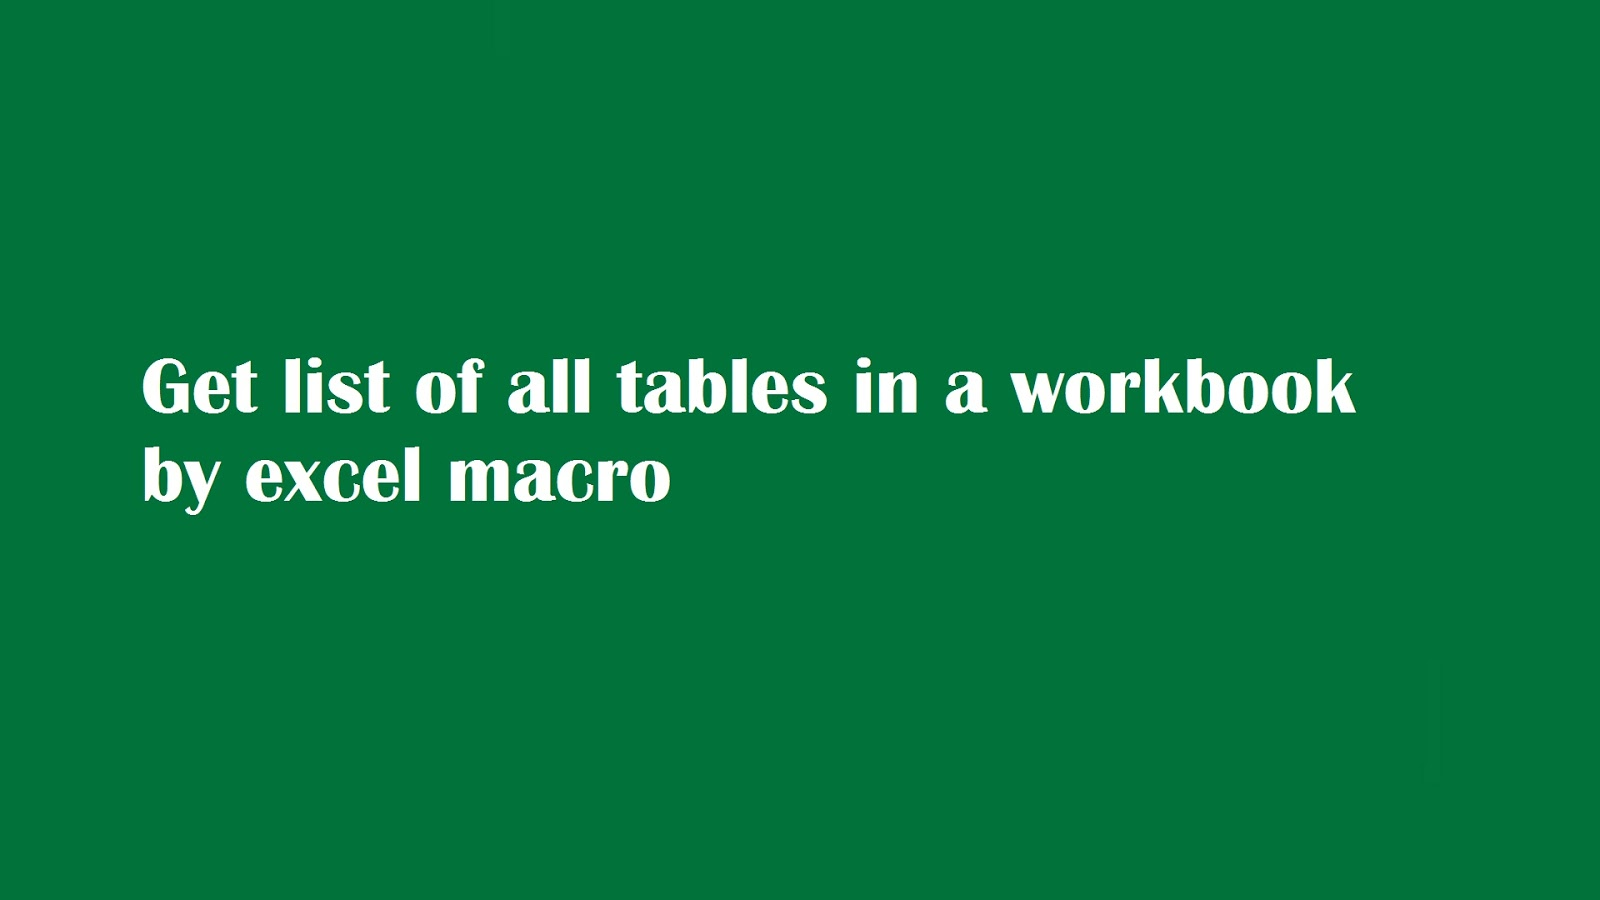 vba-tricks-and-tips-vba-code-to-list-of-table Vba Code To Order Worksheets on mysql code, unix code, smart code, fortran code, web code, cobol code, word code, digital code, angry birds go jenga code, mirror writing davinci code, perl code, dreamweaver code, vb.net code, sharepoint code, pascal code, asp code, programming code, sql code, xml code, visual basic code,